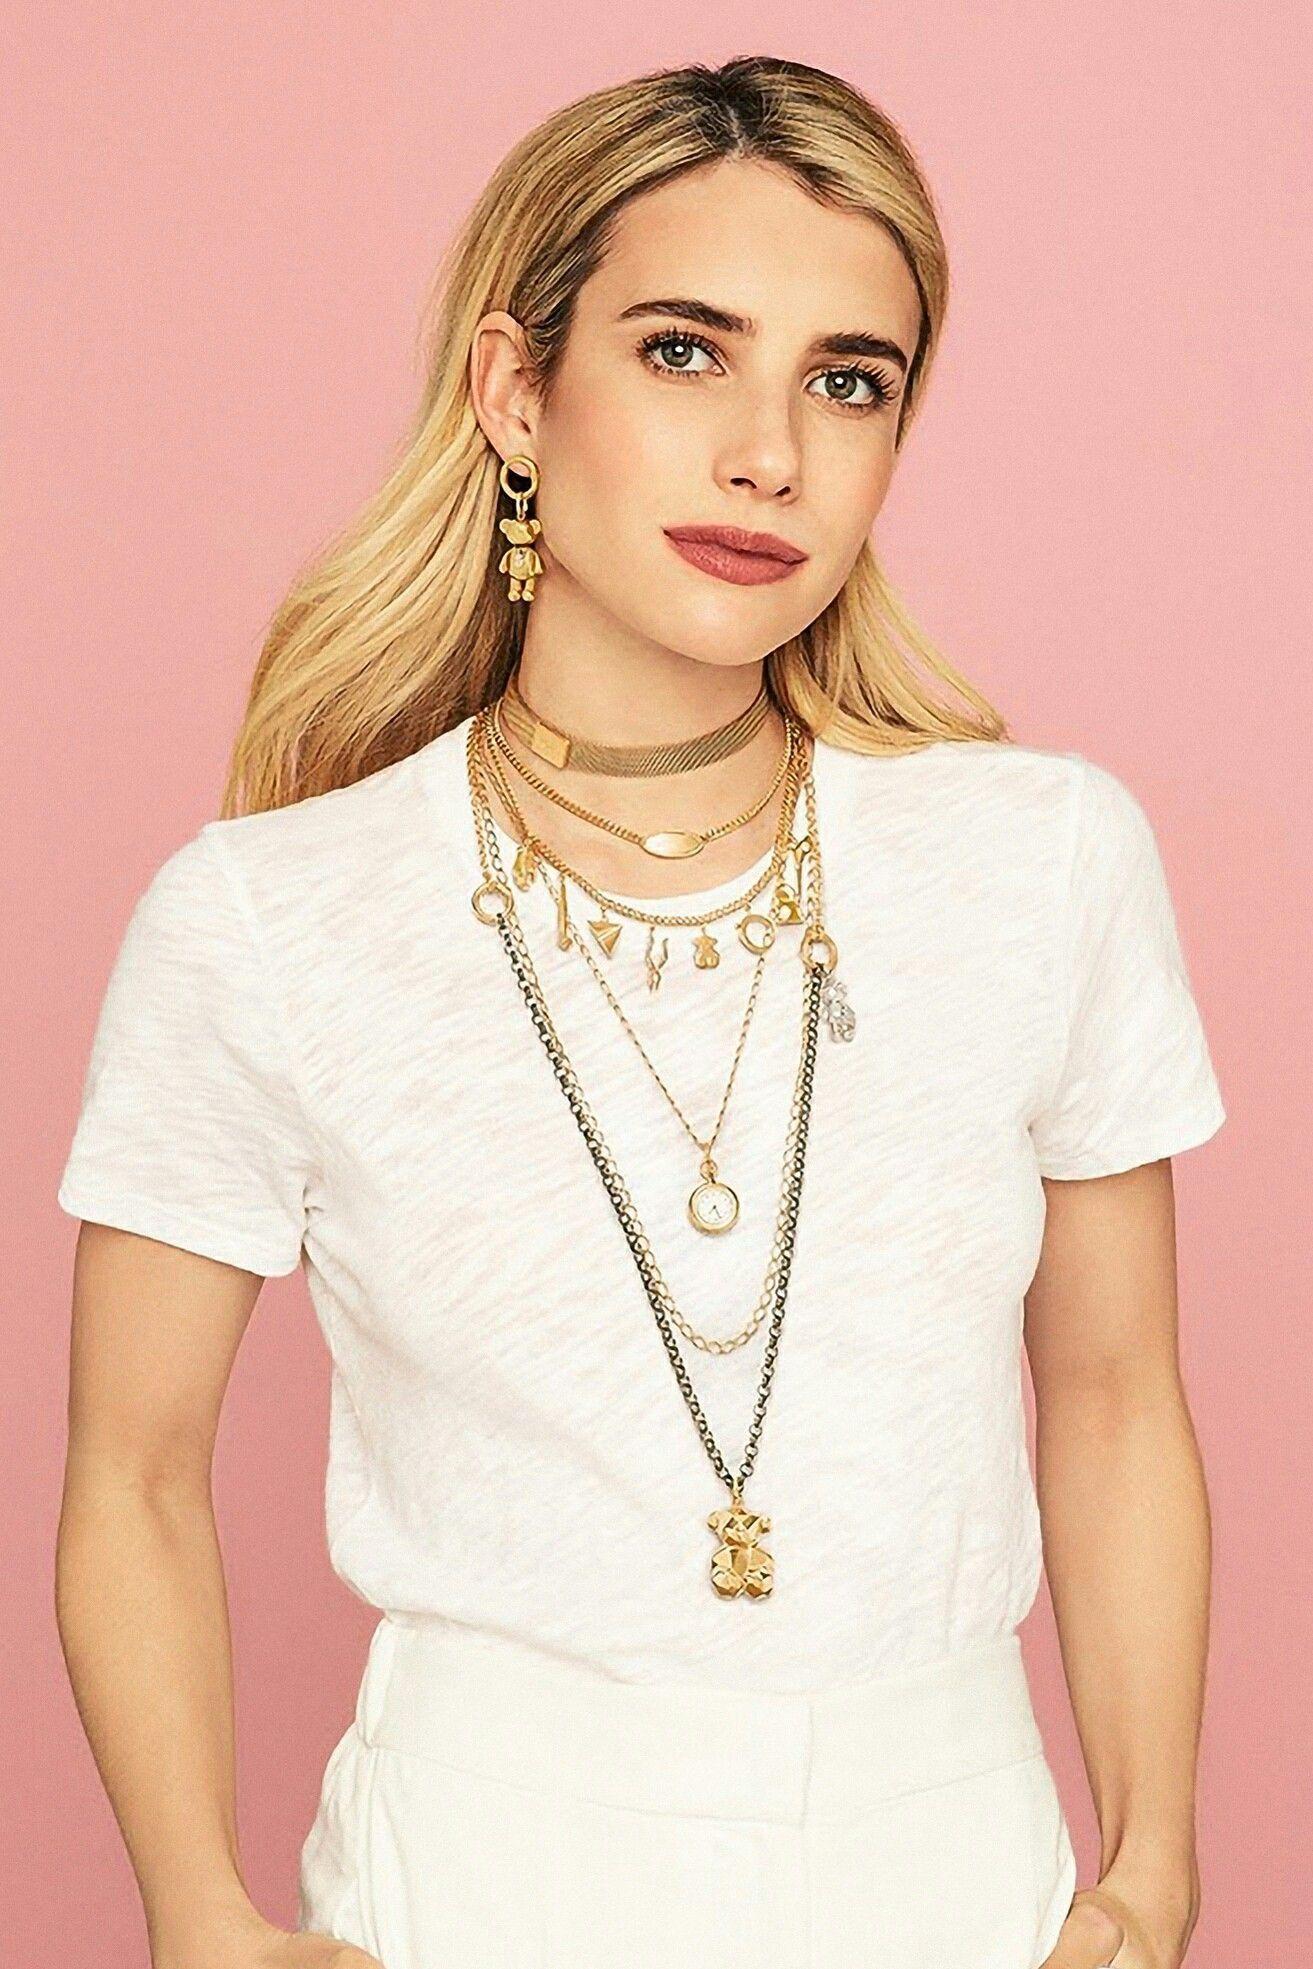 Photoshoot -  Emma Roberts for Tous  - #EmmaRoberts #FashionDesigners #photoshoot #ShilpaShetty #VictoriaBeckham